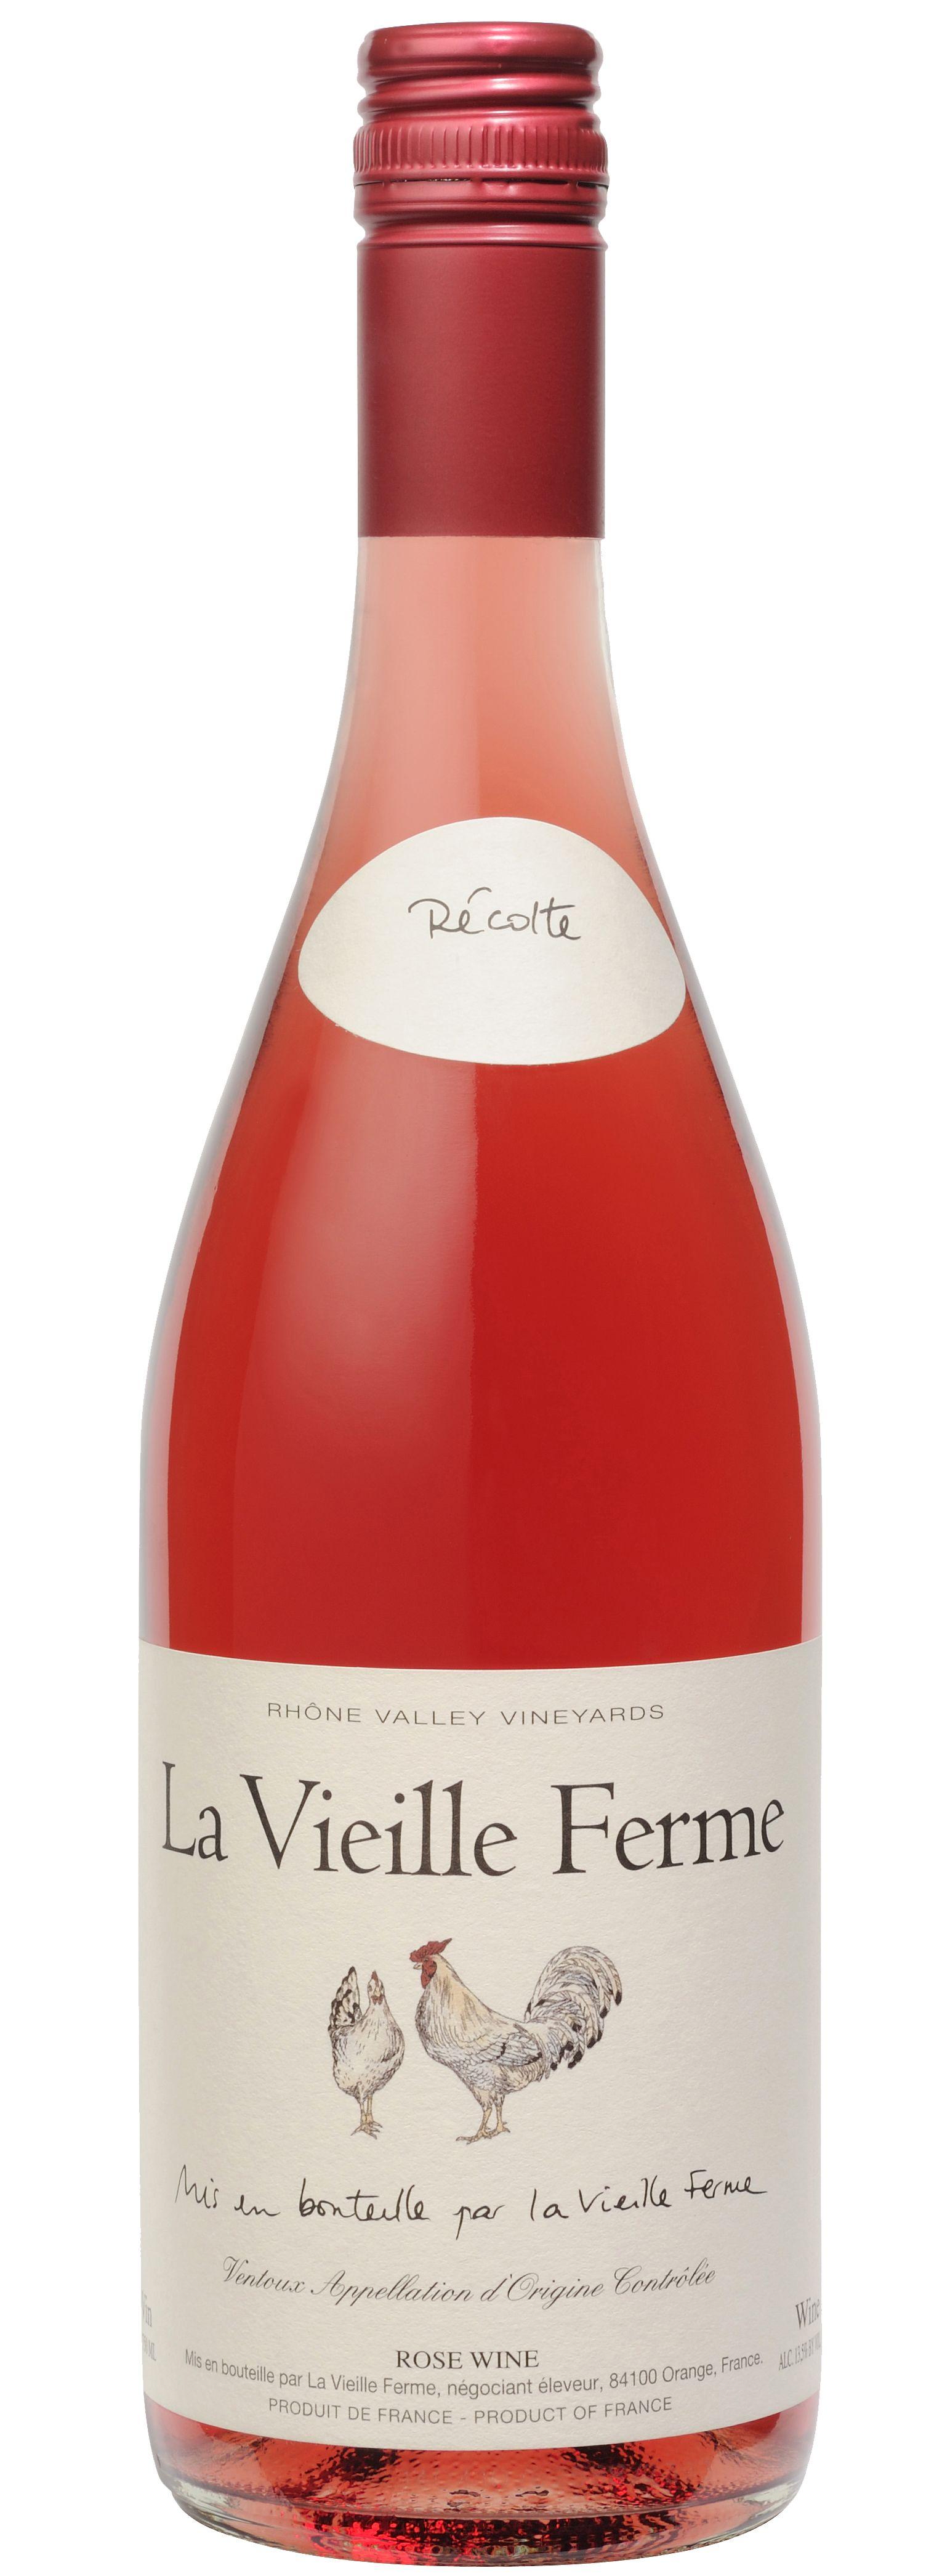 Weekend Shopping List Cono Sur La Vieille Ferme Marques De Caceres Wine The Detroit News Vino Rosado Vinos Vino